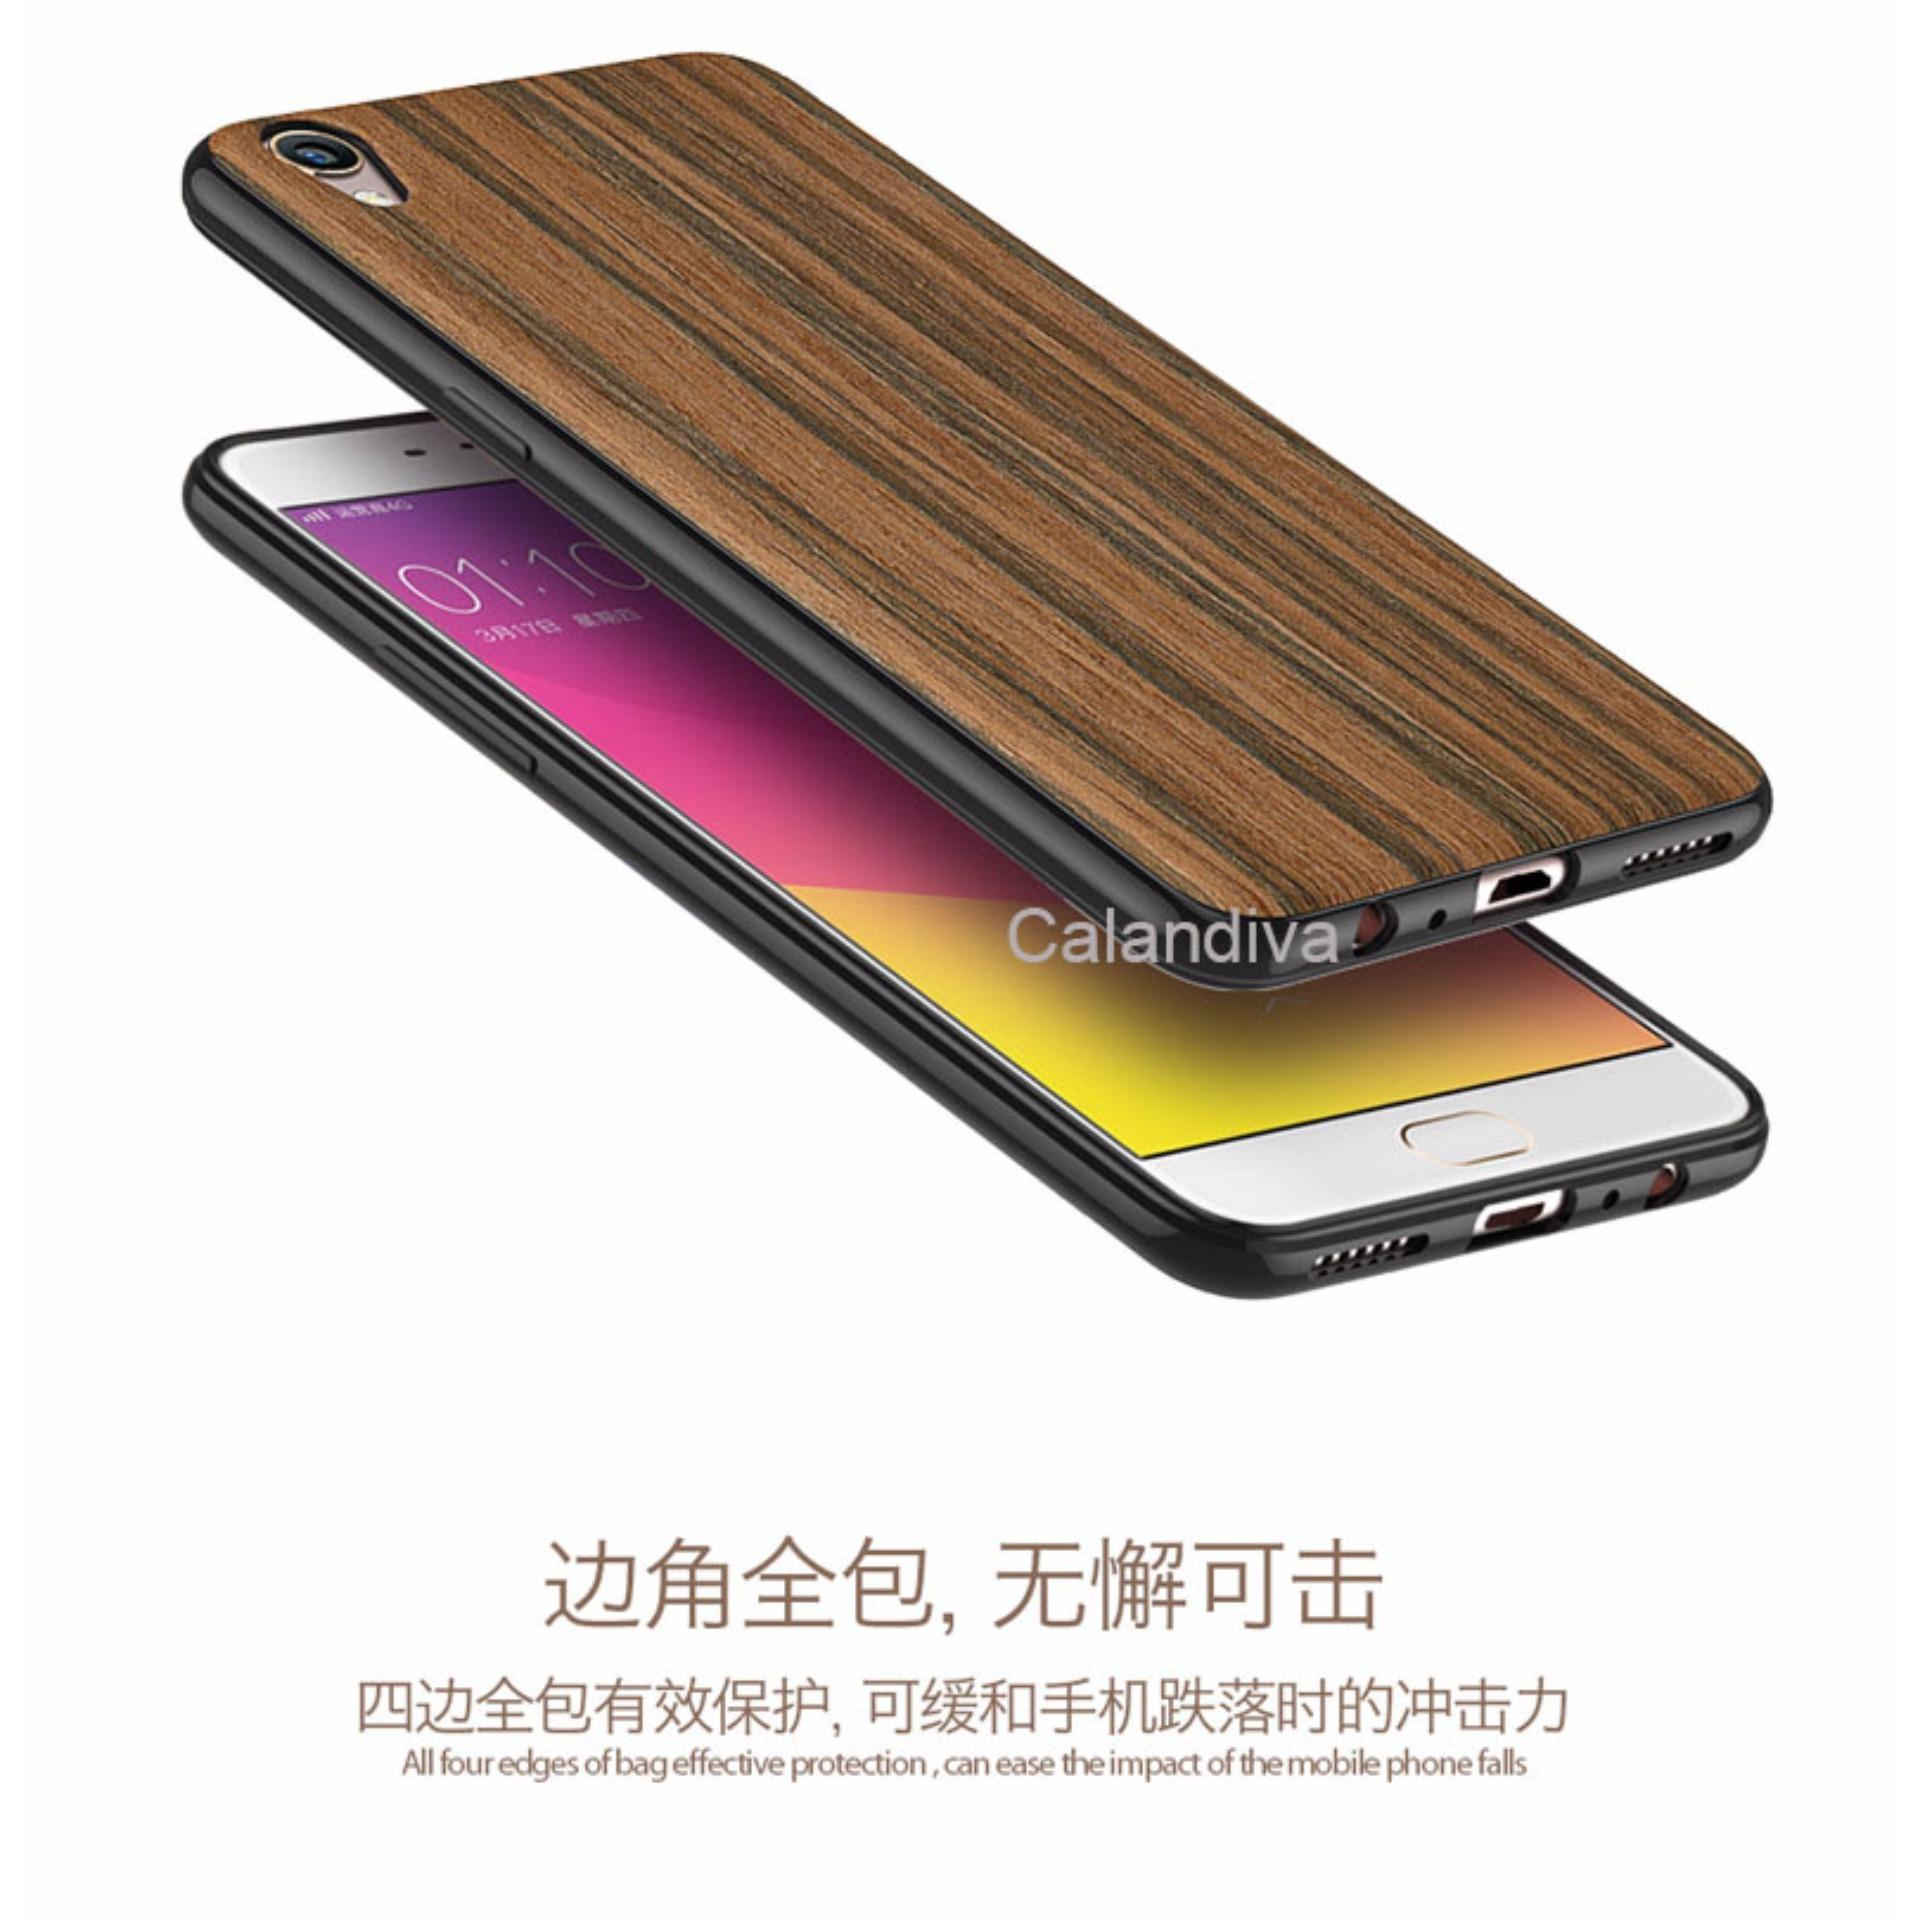 Calandiva Fish Shockproof Hybrid Case Untuk Oppo F1 Plus R9 Hitam Tempered Glass Full Cover For Wood Texture Slim Softcase Coklat